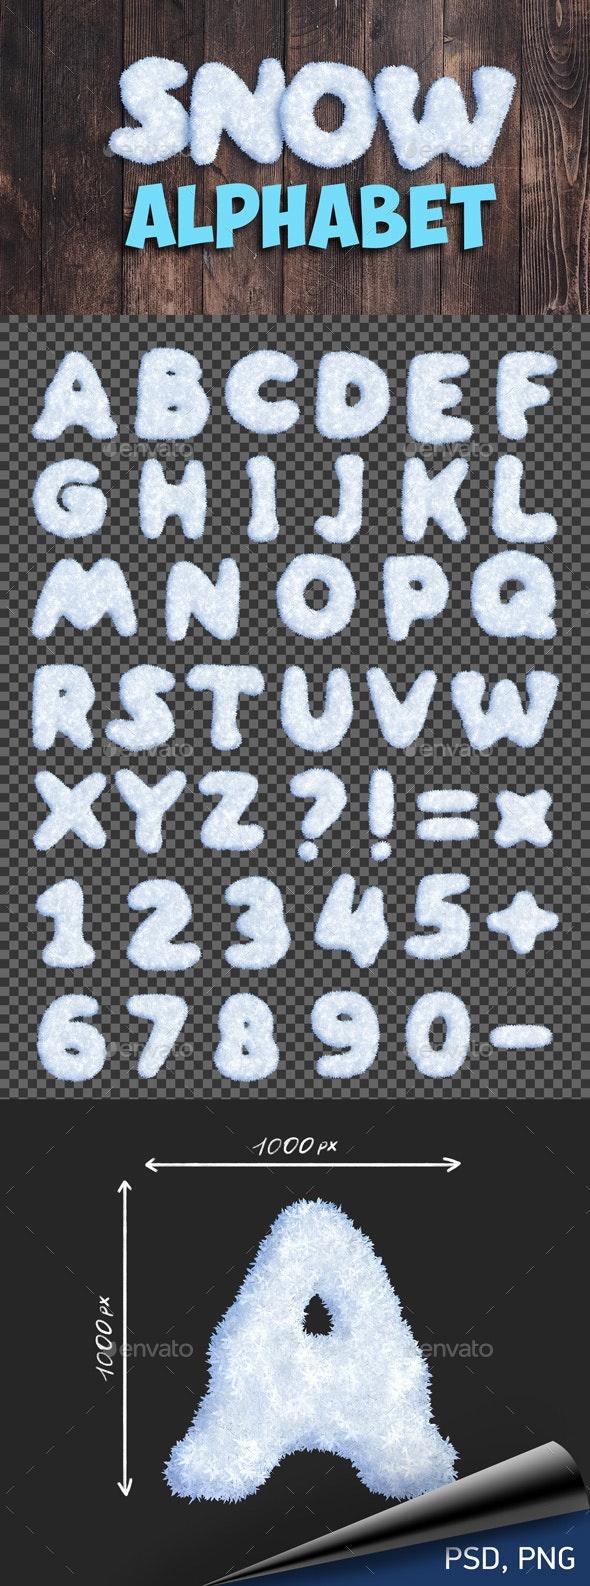 Snow Alphabet - Text 3D Renders